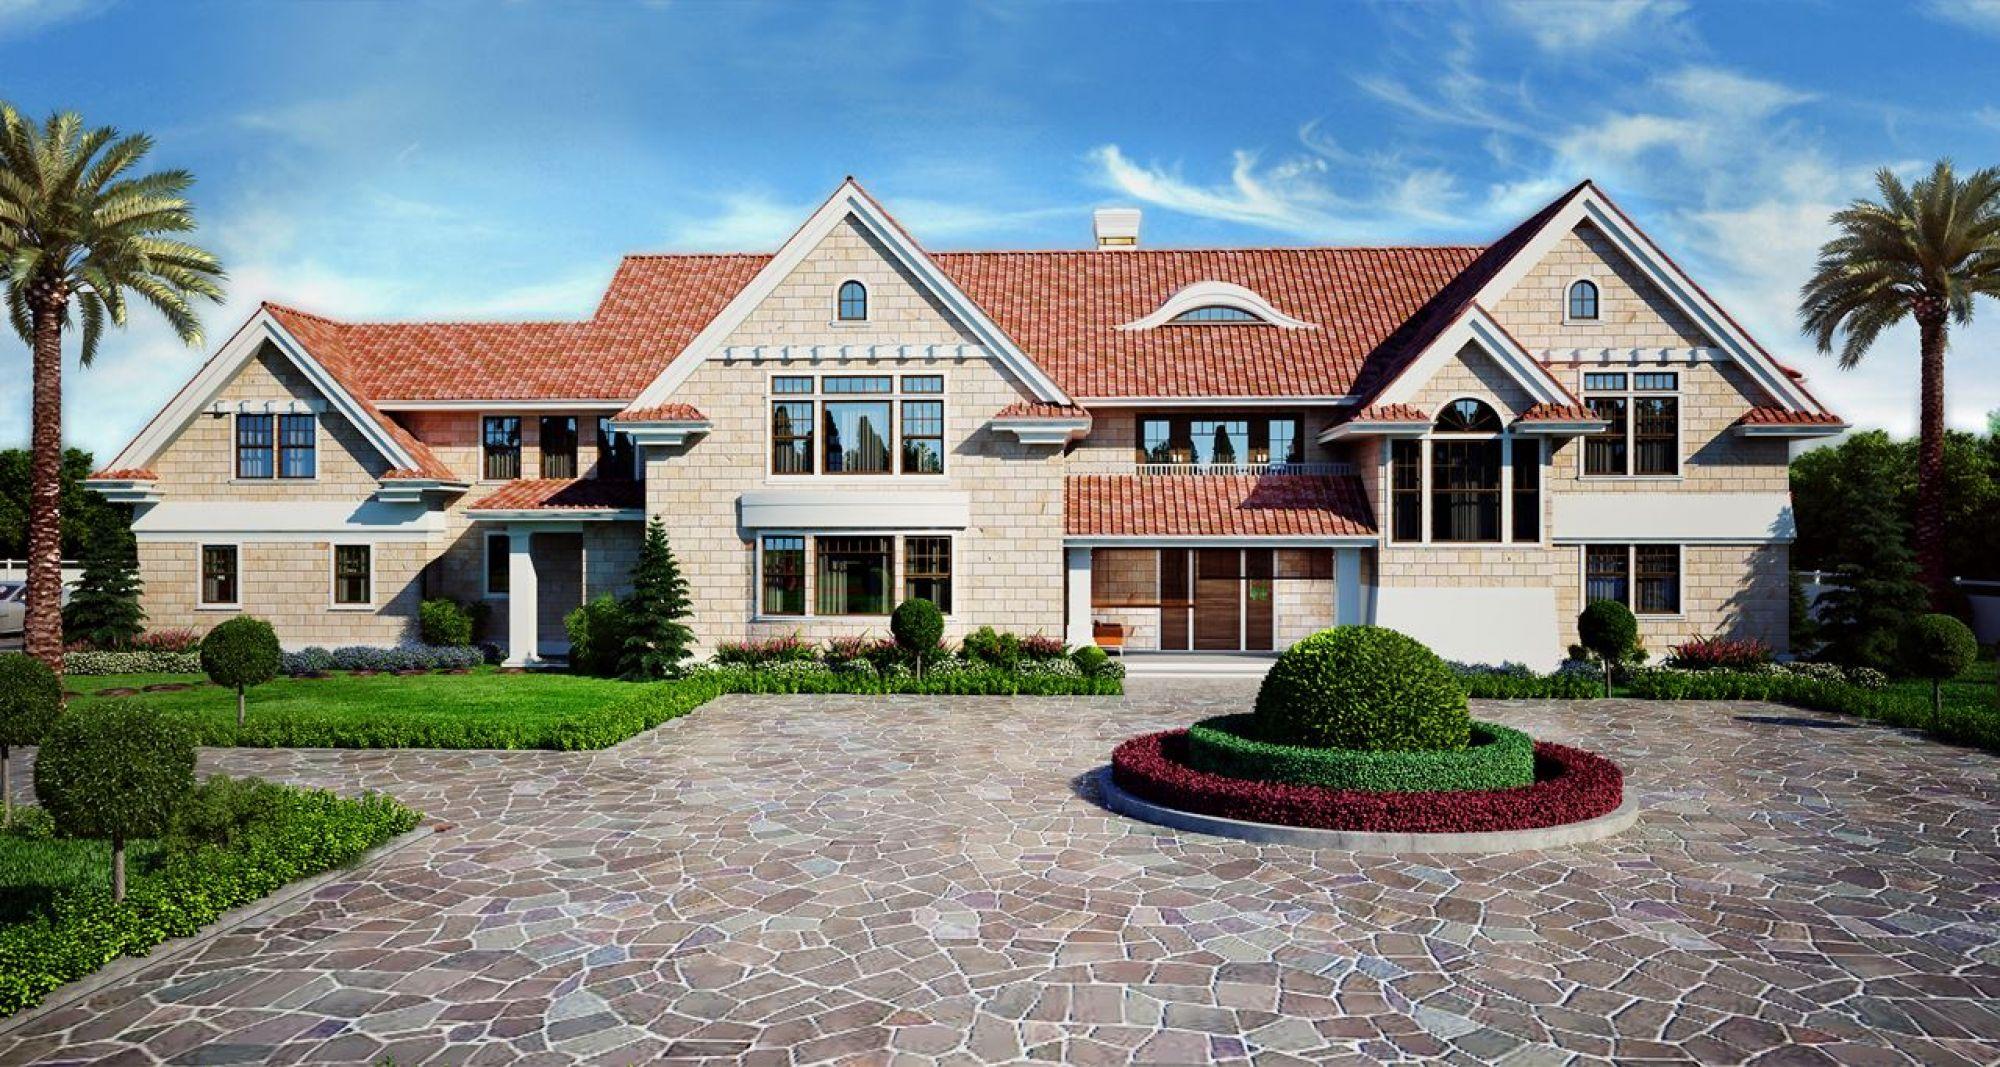 verandah house designs Home Design Verandah House Designs